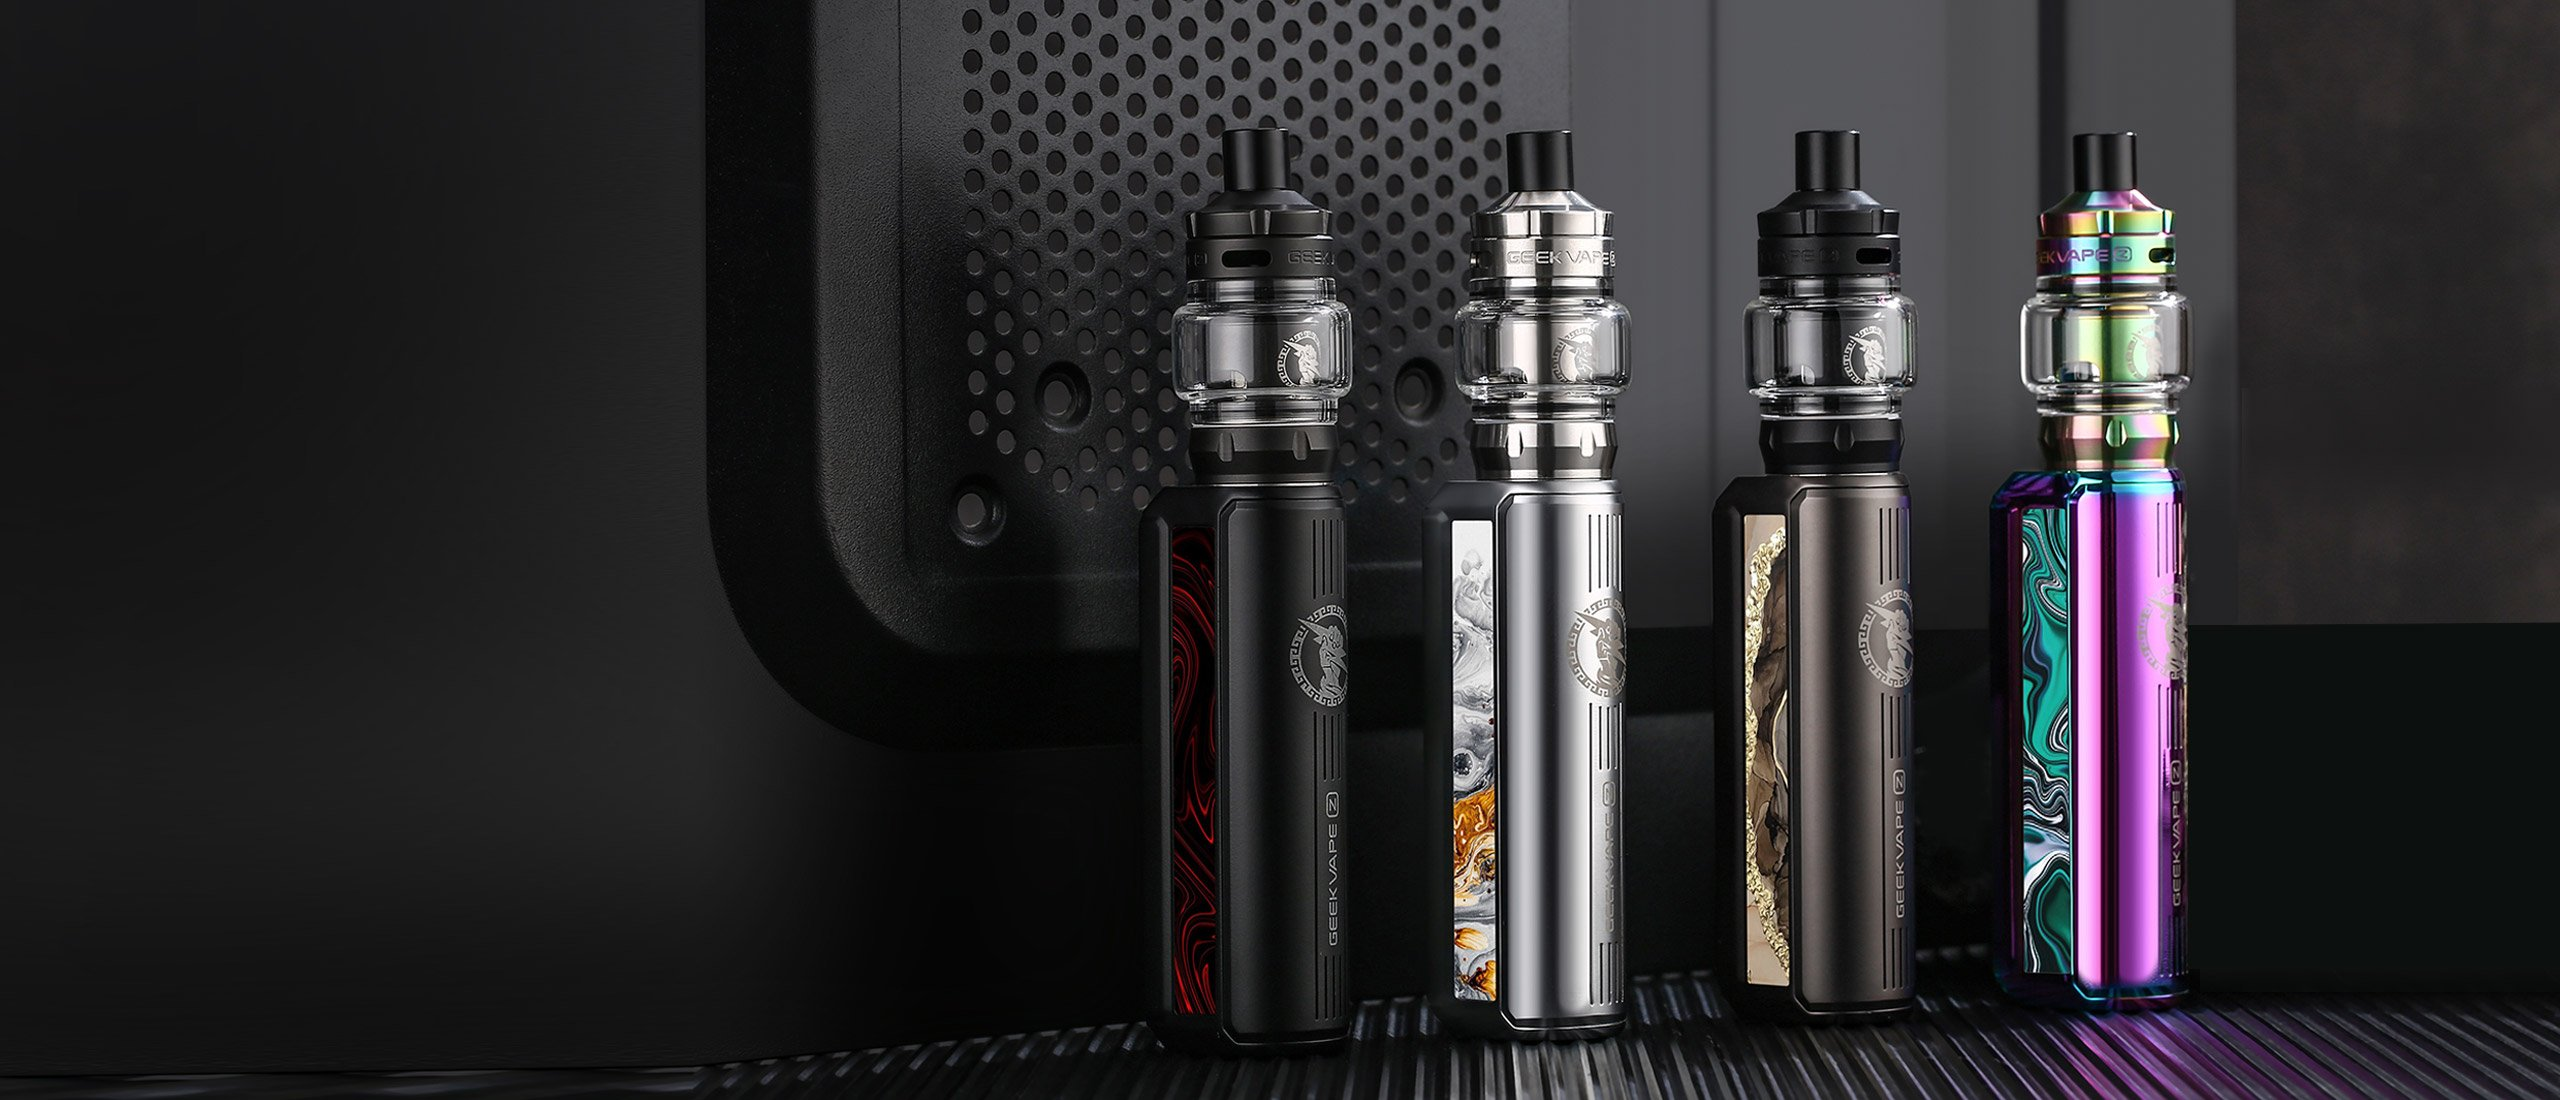 GeekVape Z50 Kit UK Promo